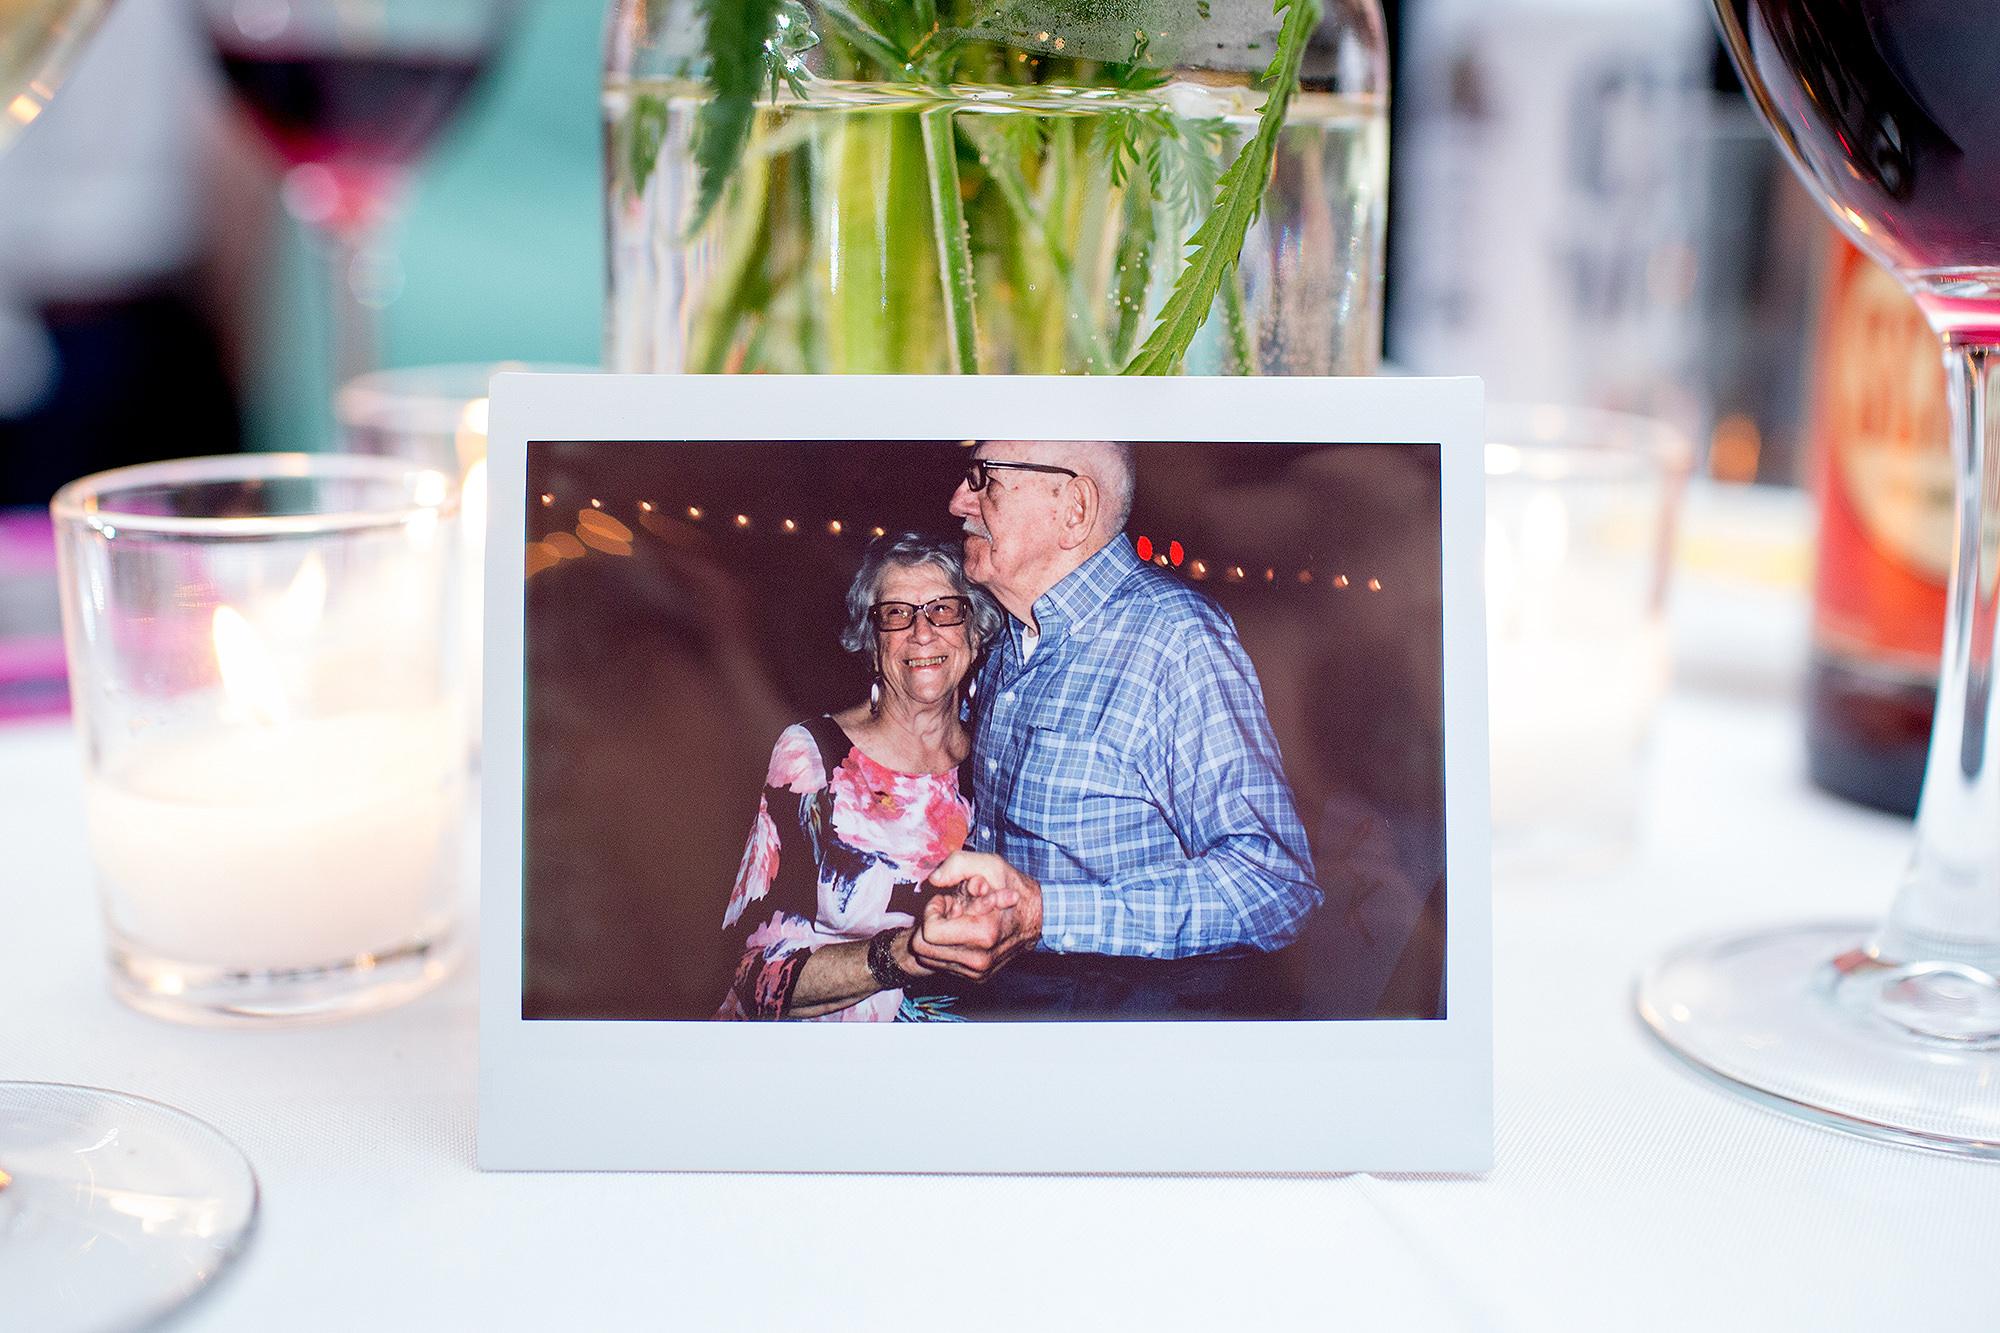 6-grandma-grandpa-dancing-wedding-reception-sarah-corbett-photography-polaroids.jpg